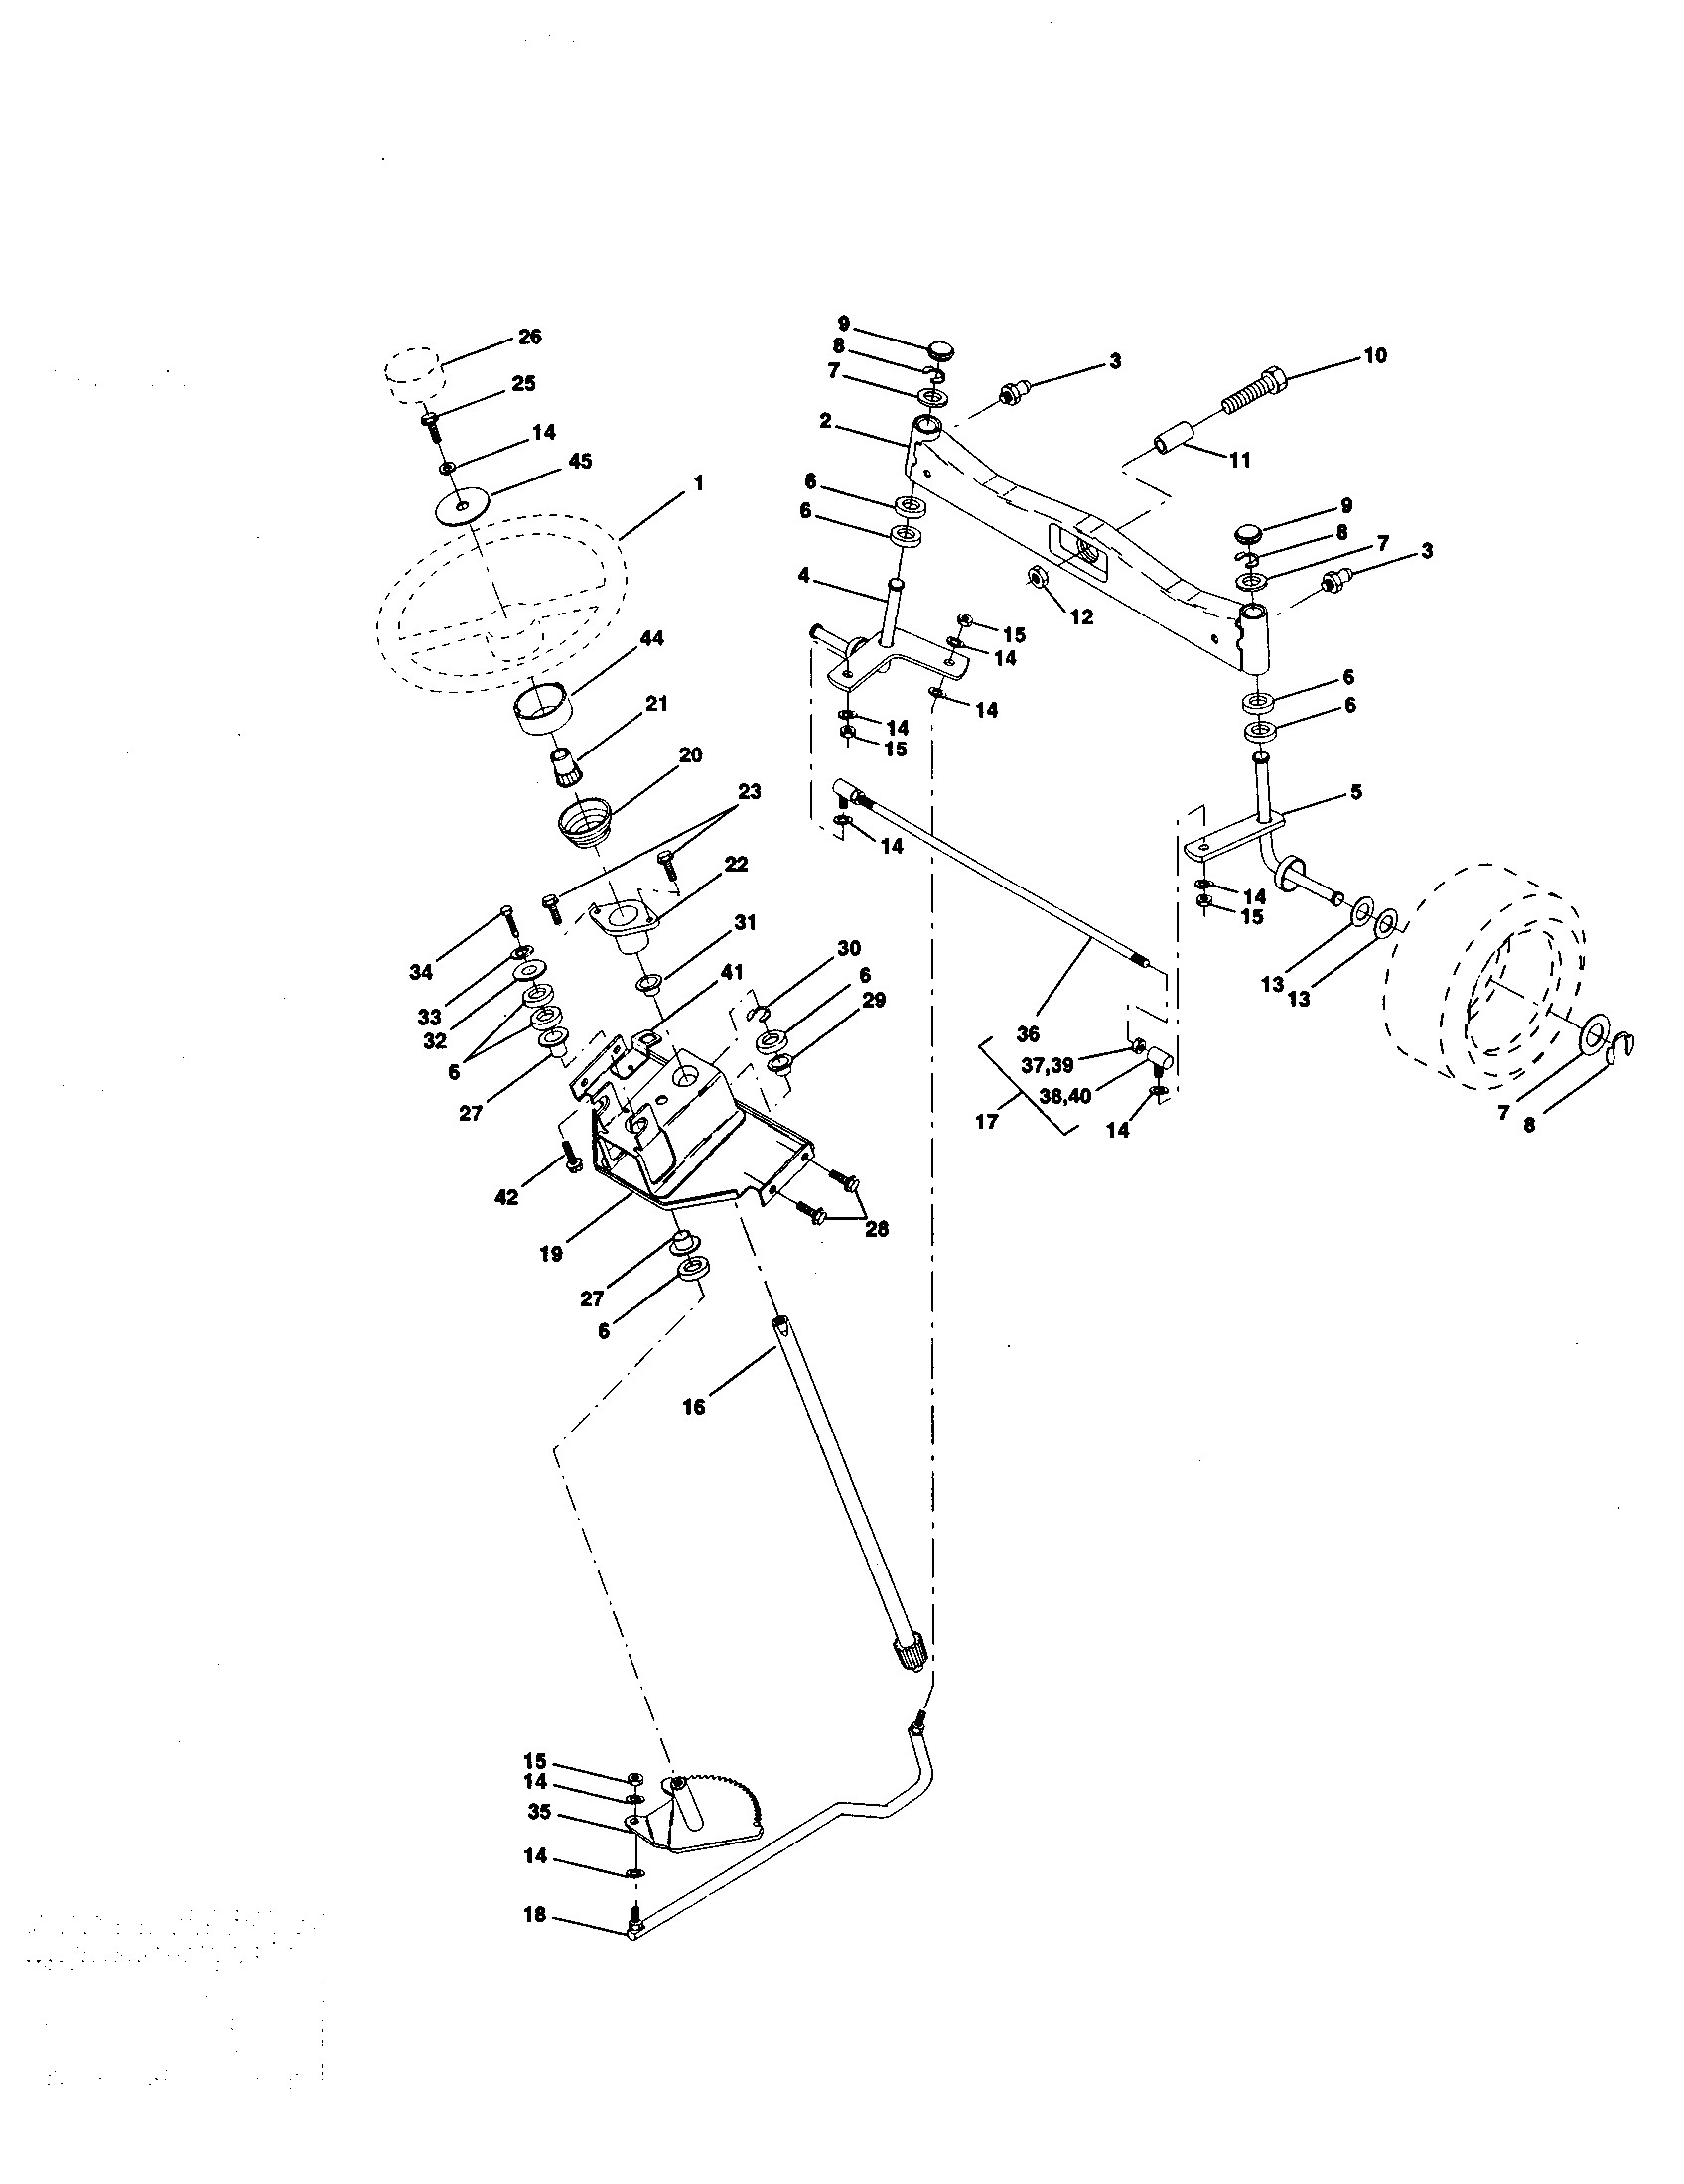 Craftsman Gt 5000 Parts Diagram Steering assembly Diagram & Parts List for Model Craftsman Of Craftsman Gt 5000 Parts Diagram